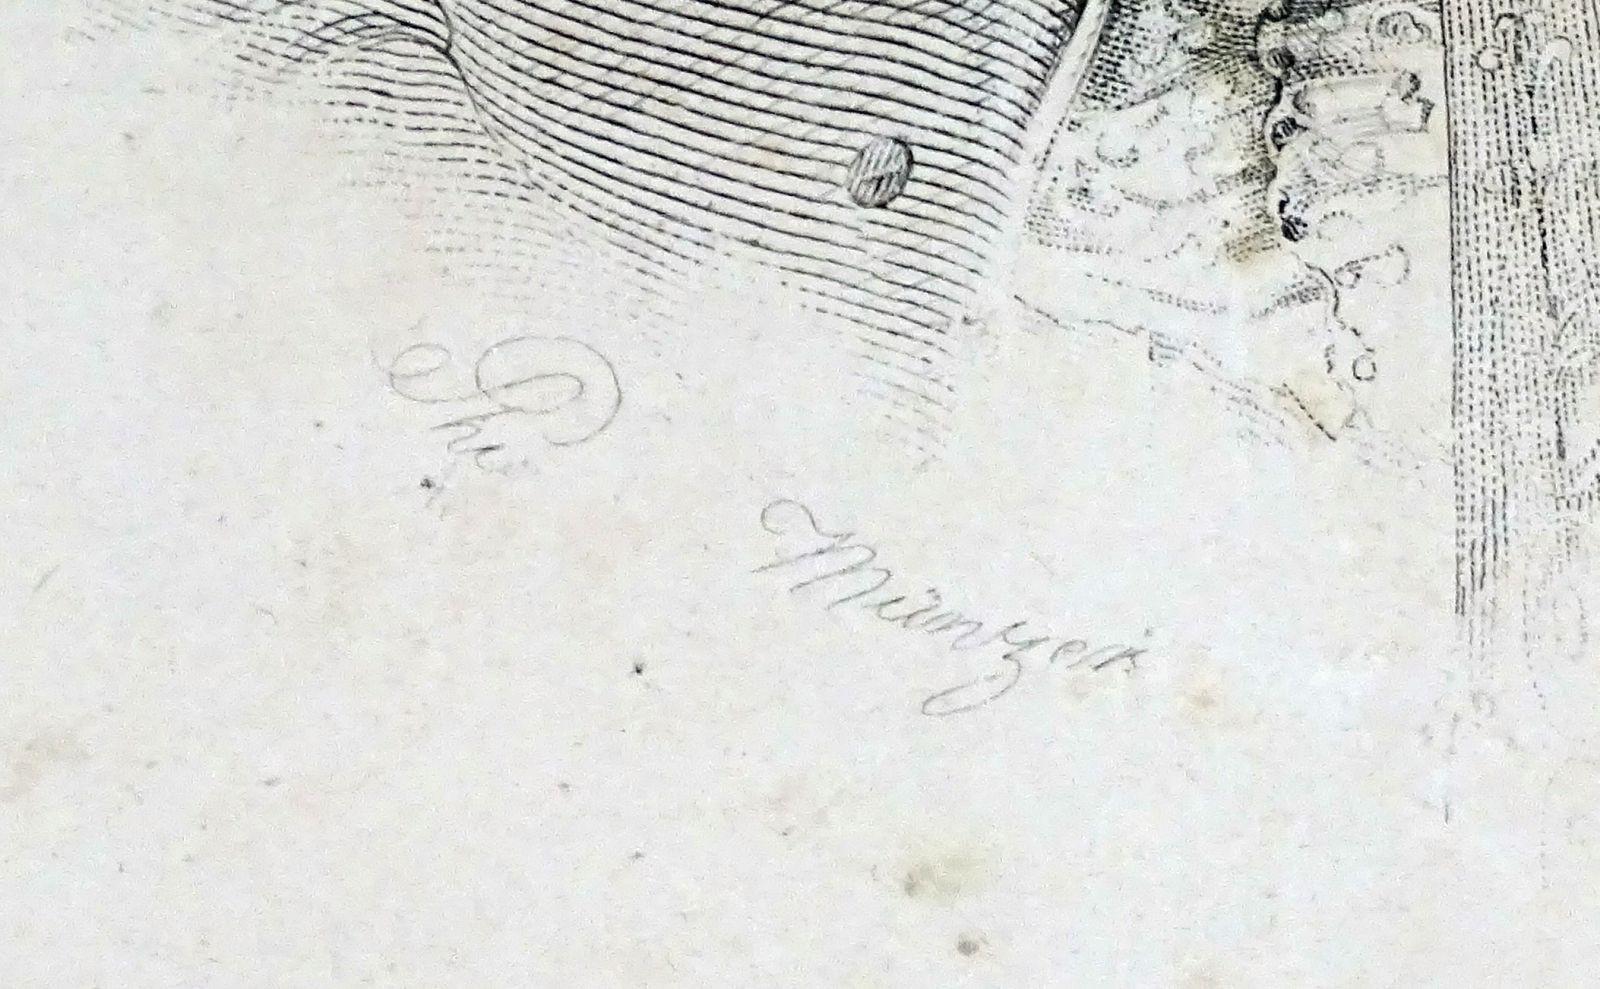 DSC03472.JPG (1600×989)